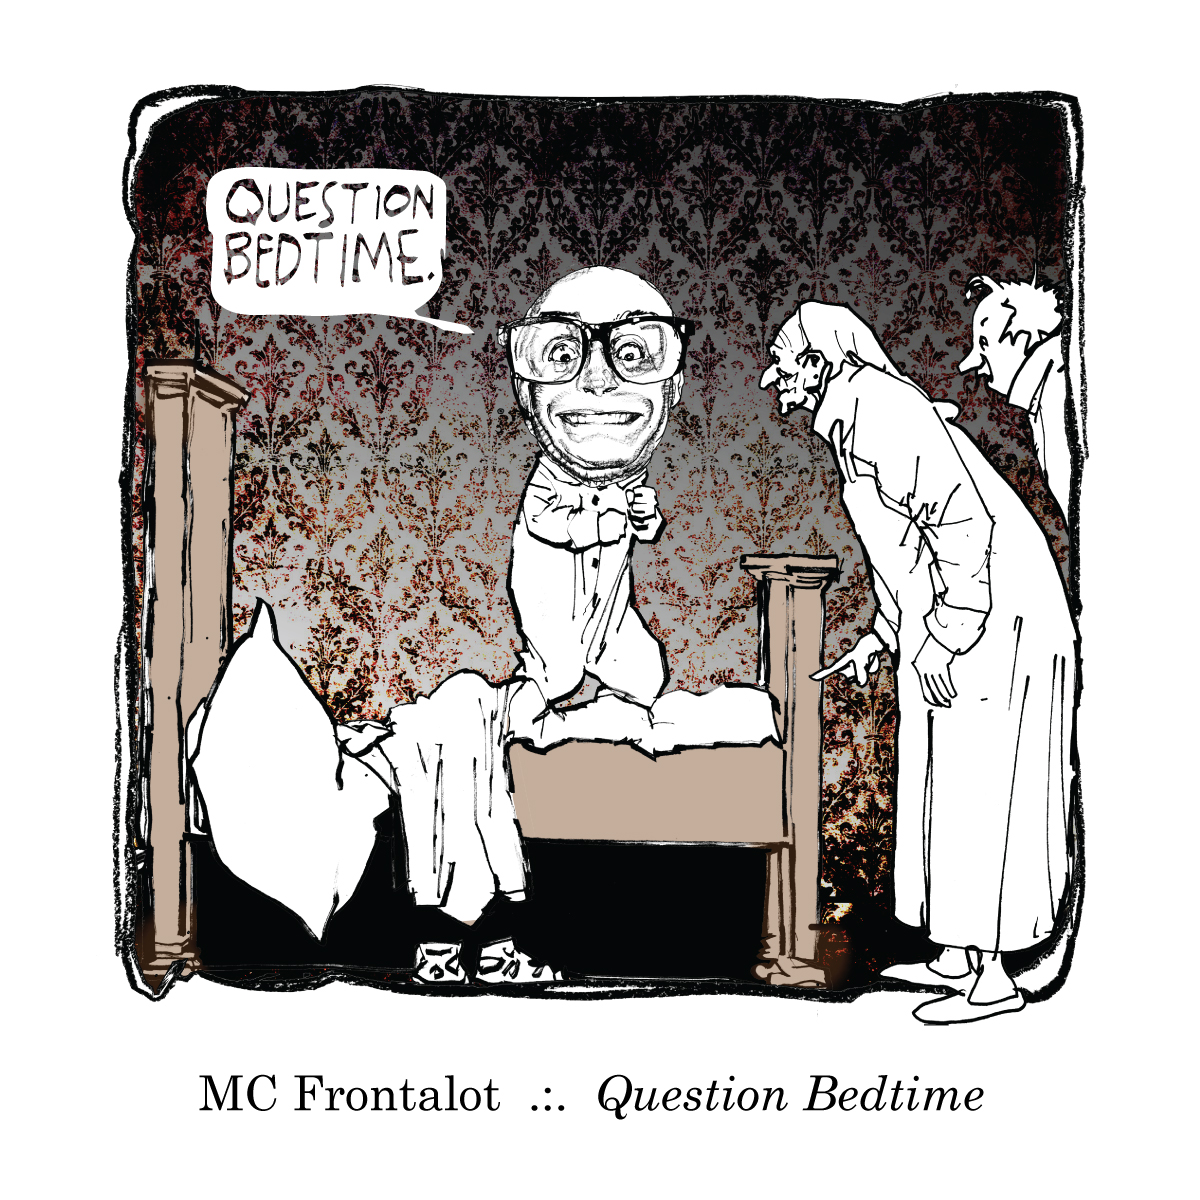 mc-frontlalot-question-bedtime